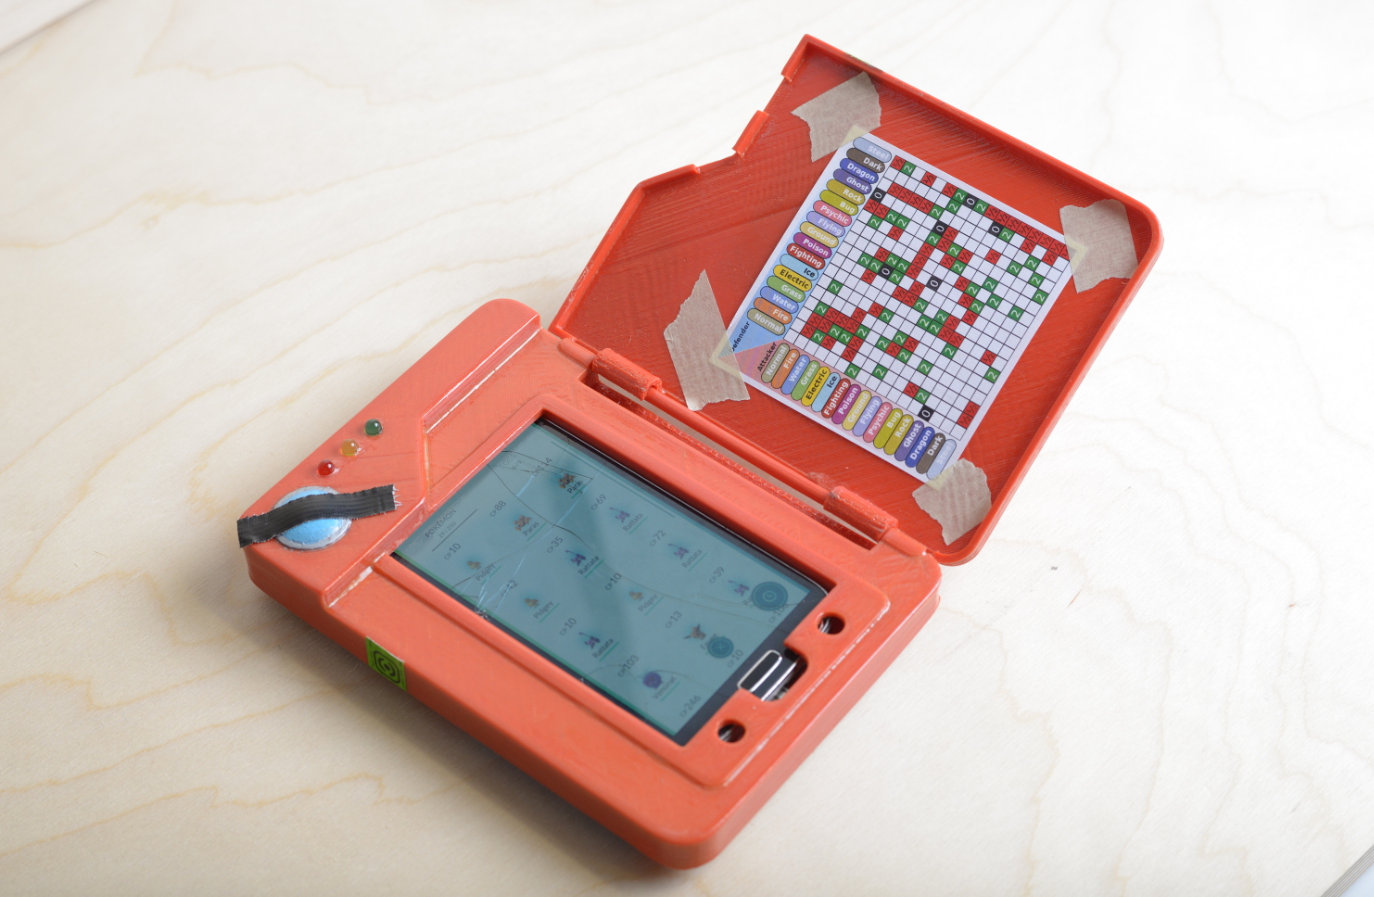 Pokedex Pokemon GO (2)